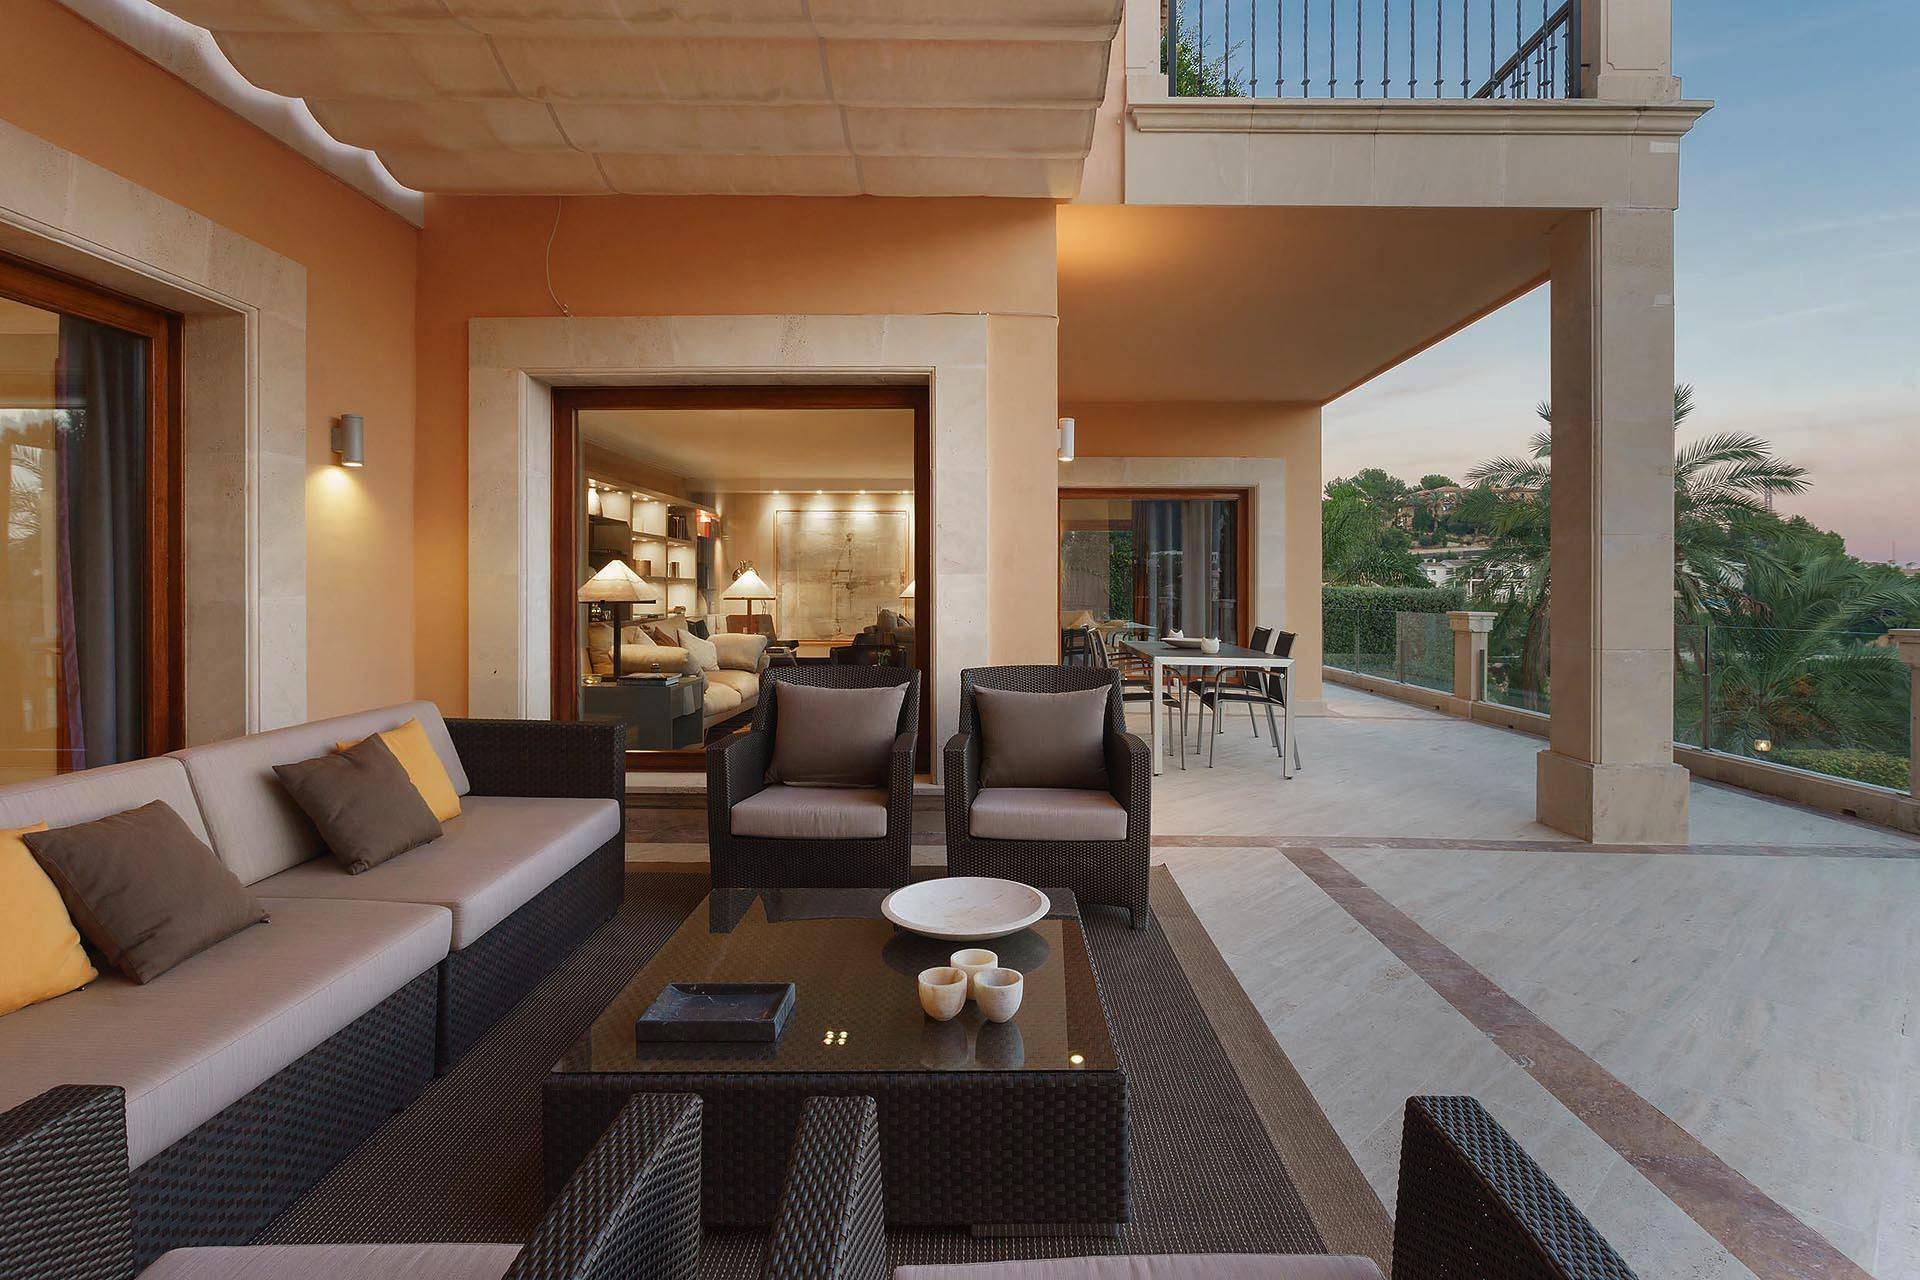 01-280 großzügige Villa nahe Palma de Mallorca Bild 8